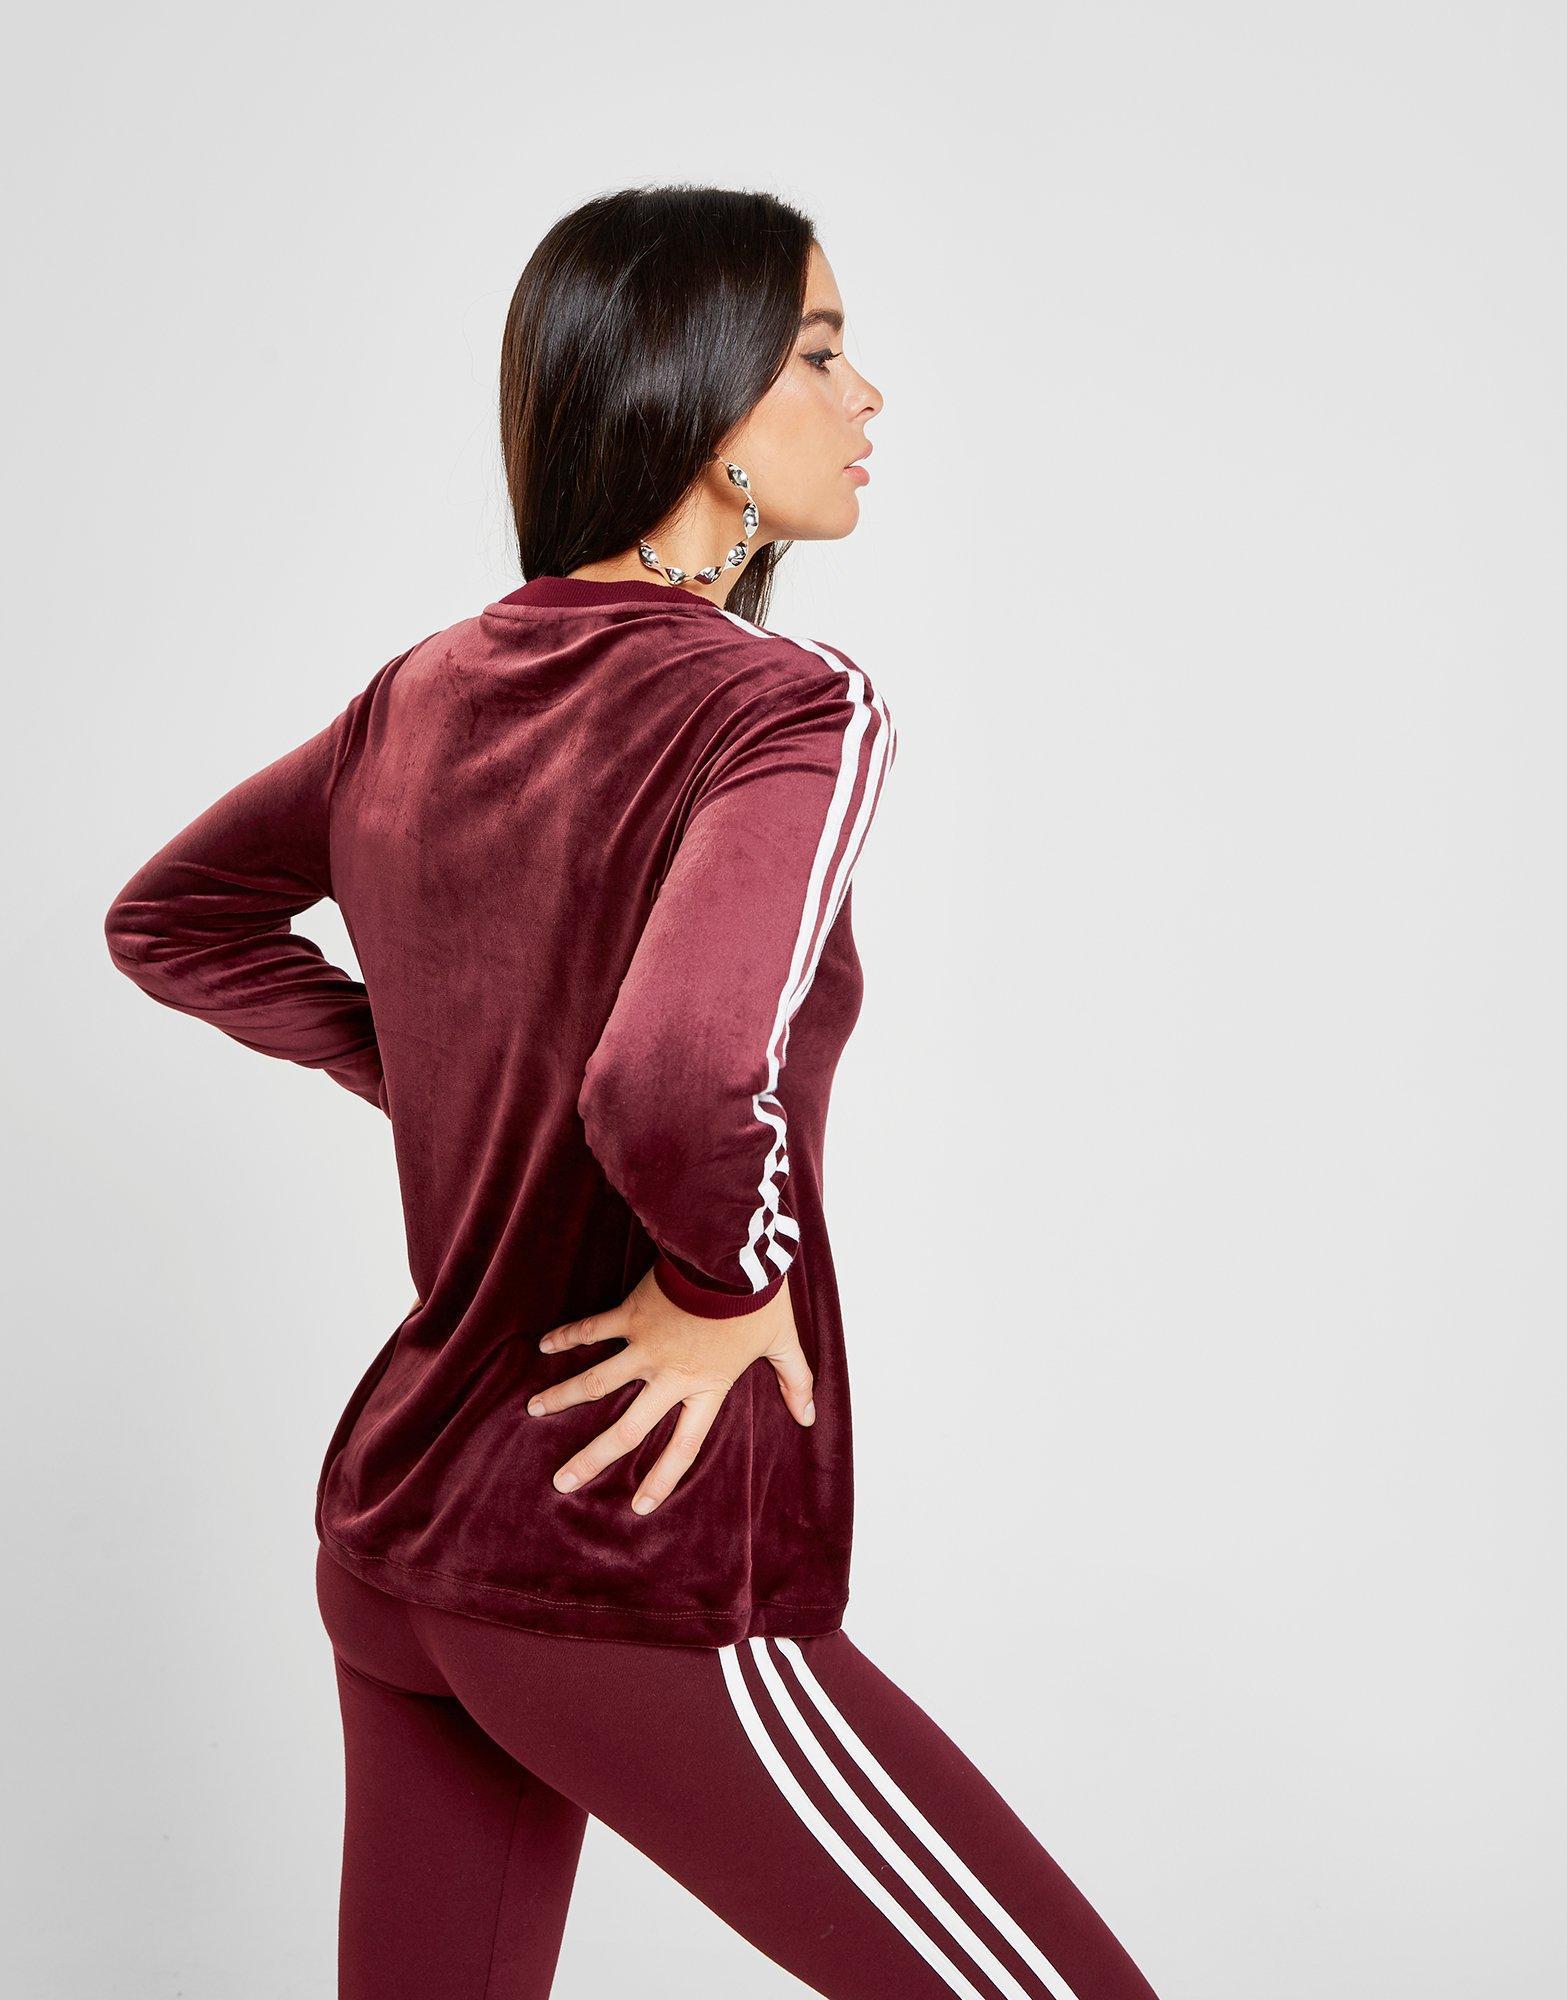 Adidas Originals 3 Stripes Velvet Long Sleeve California T Shirt In